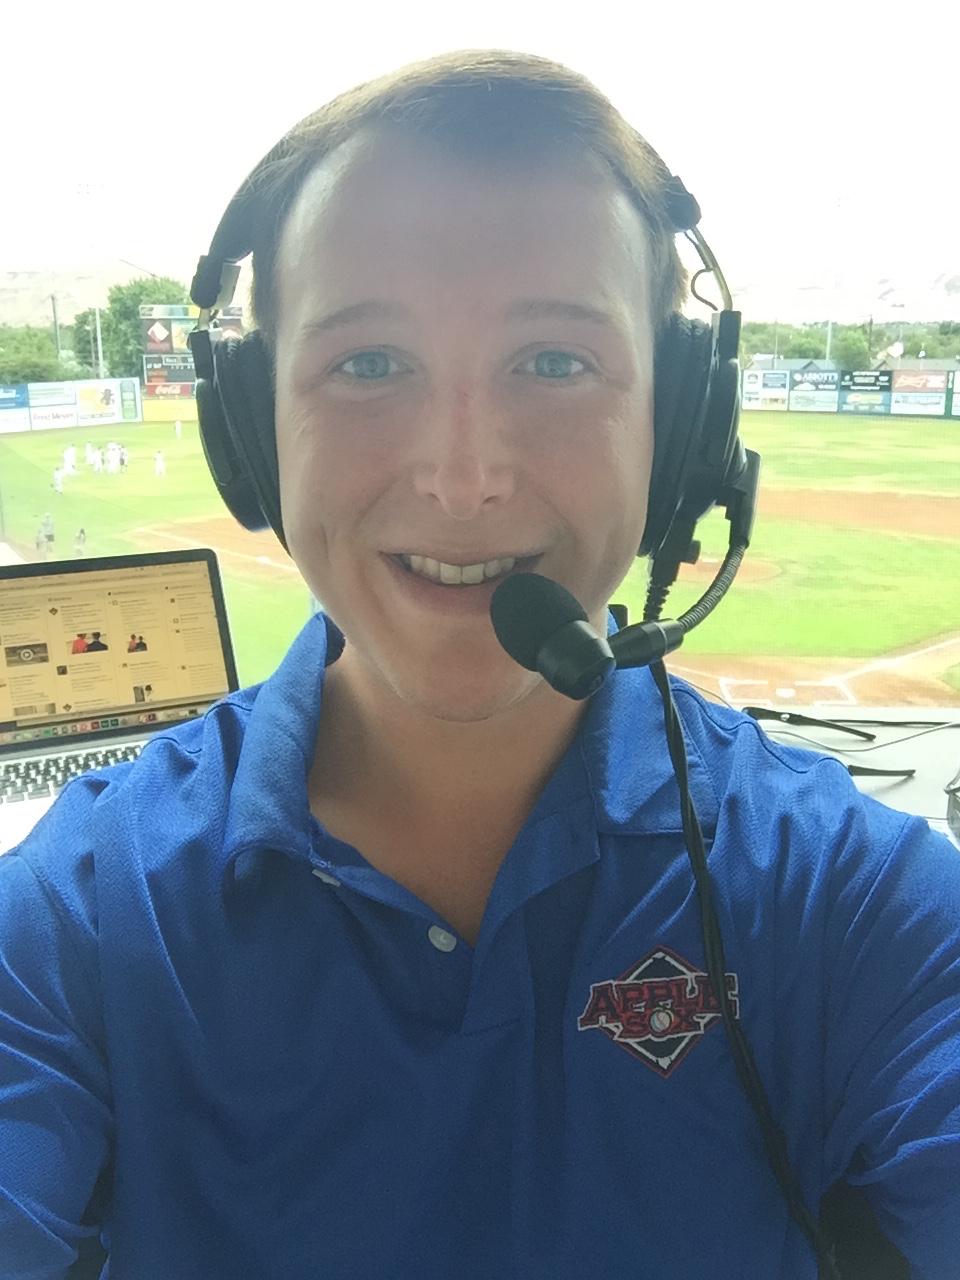 Broadcasting West Coast League baseball for the Wenatchee AppleSox, in Yakima, Wash., July, 2016.